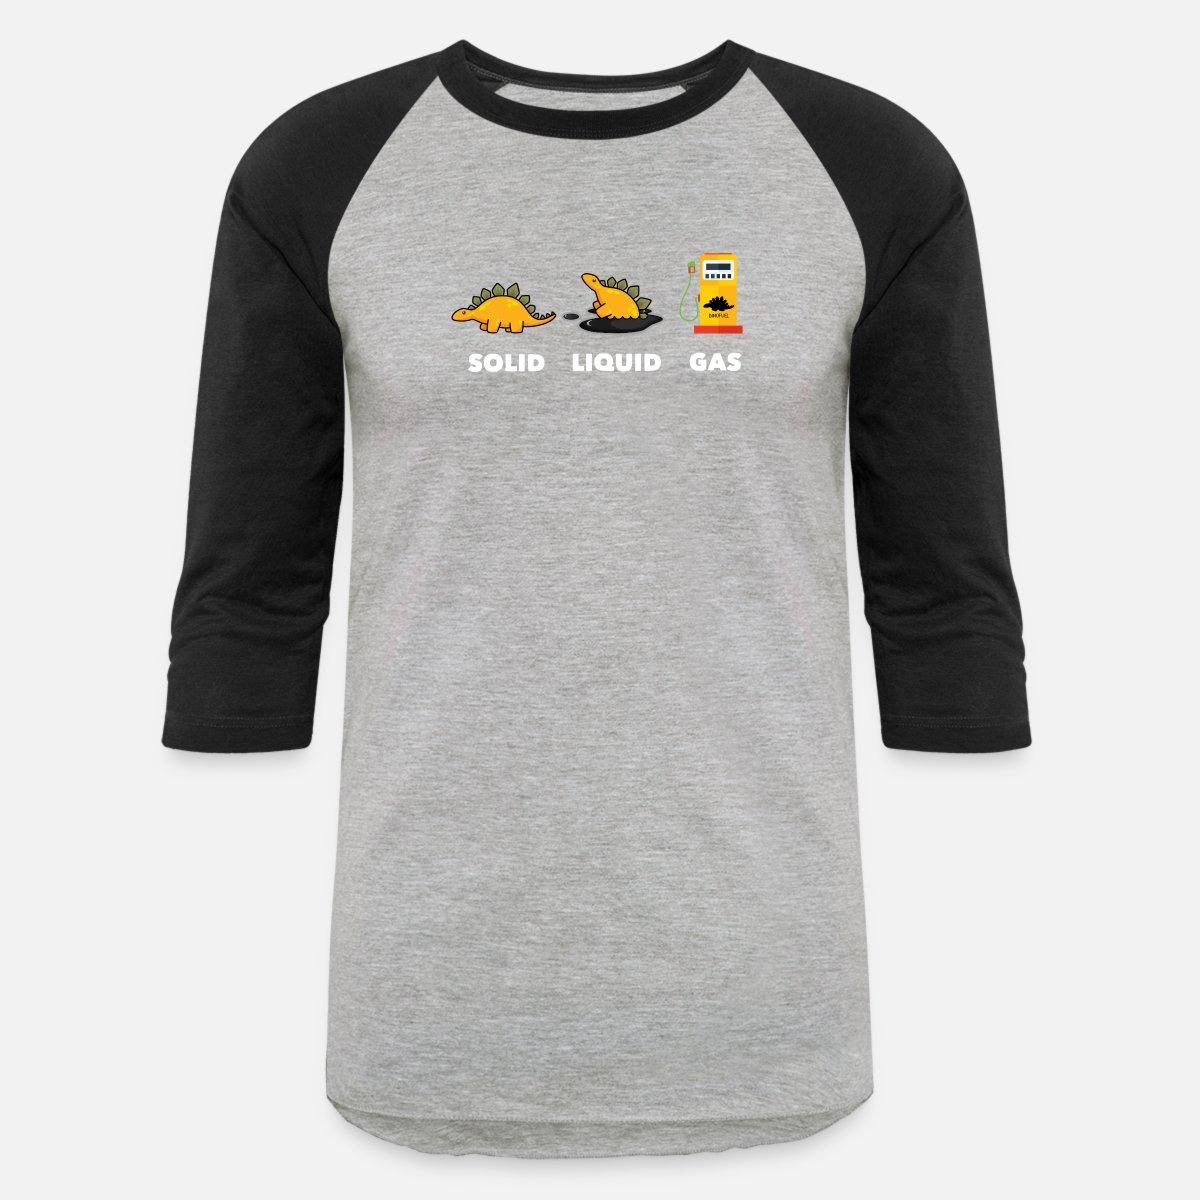 d646d34b Dinosaur States Solid Liquid Gas Unisex Baseball T-Shirt | Spreadshirt